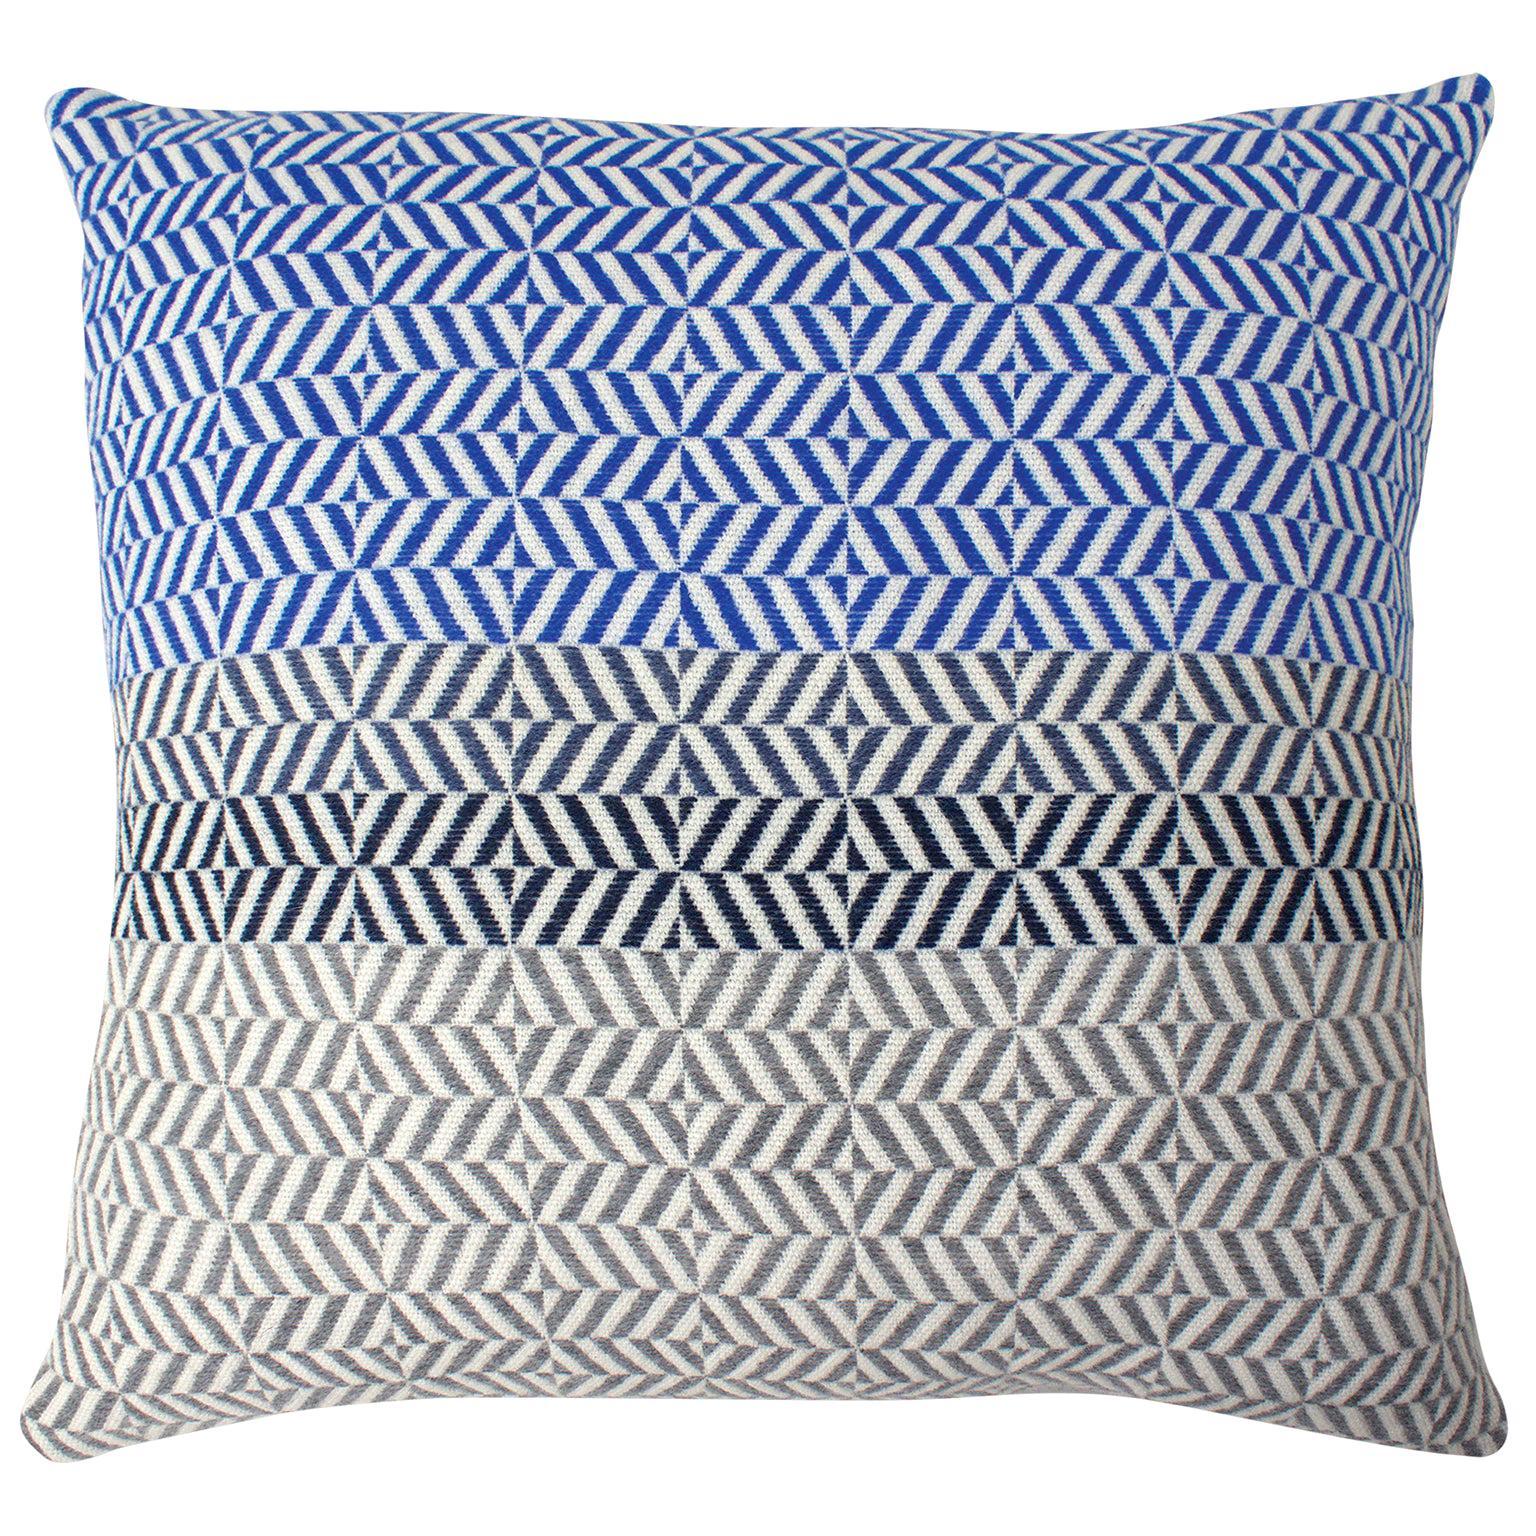 Handwoven 'Uccle' Block Geometric Merino Wool Cushion Pillow, Indigo/Blue/Grey